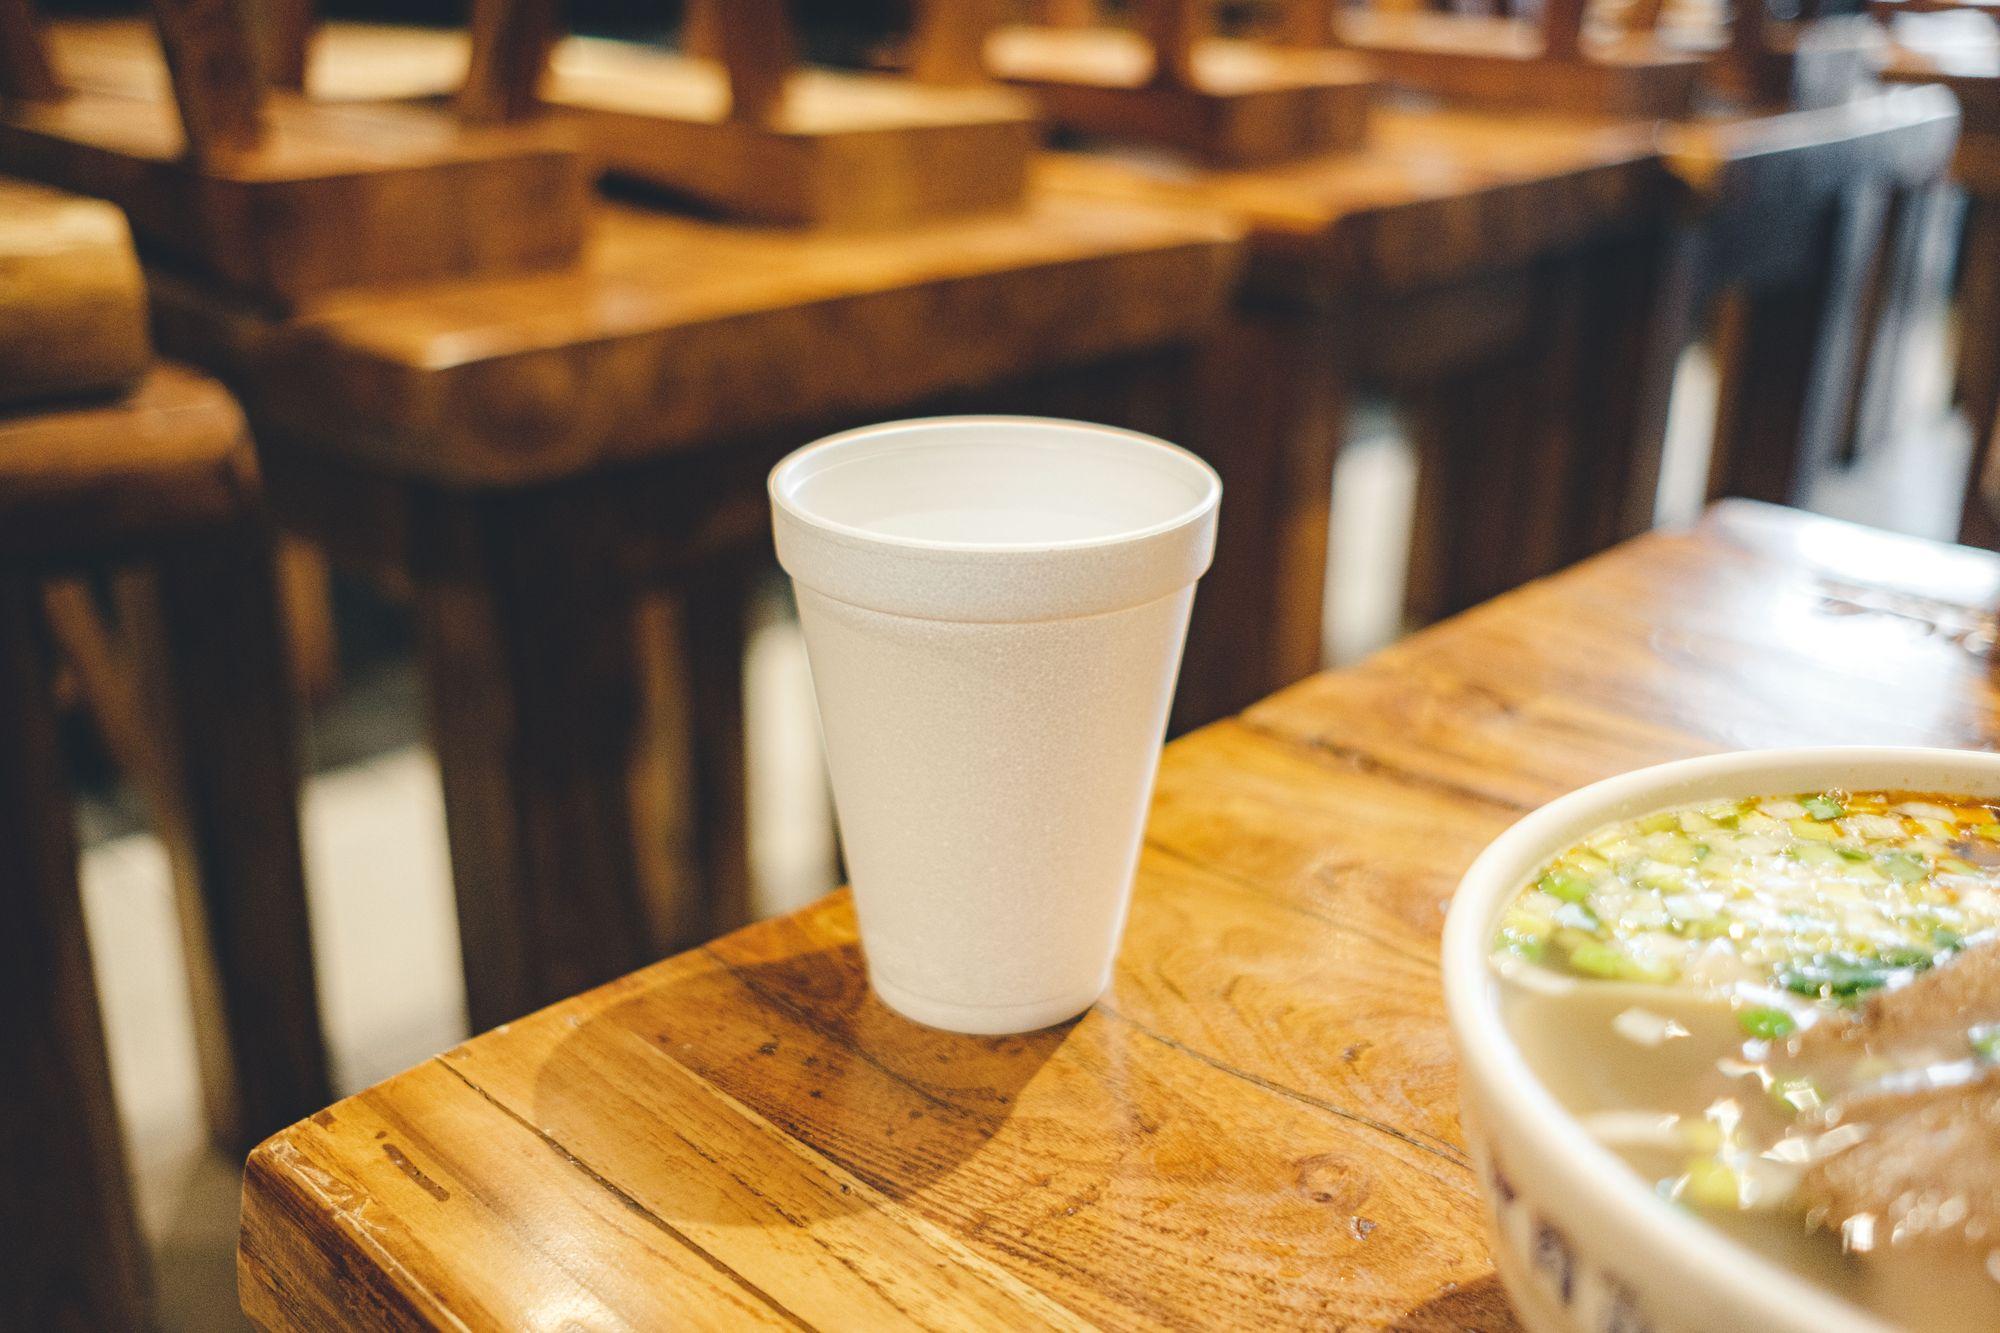 Water in Styrofoam Cup